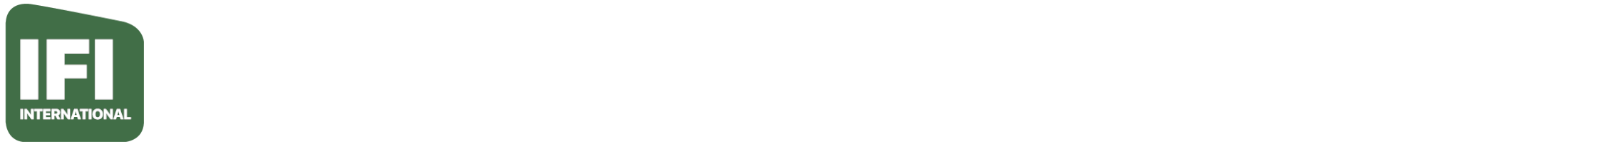 IFII logo